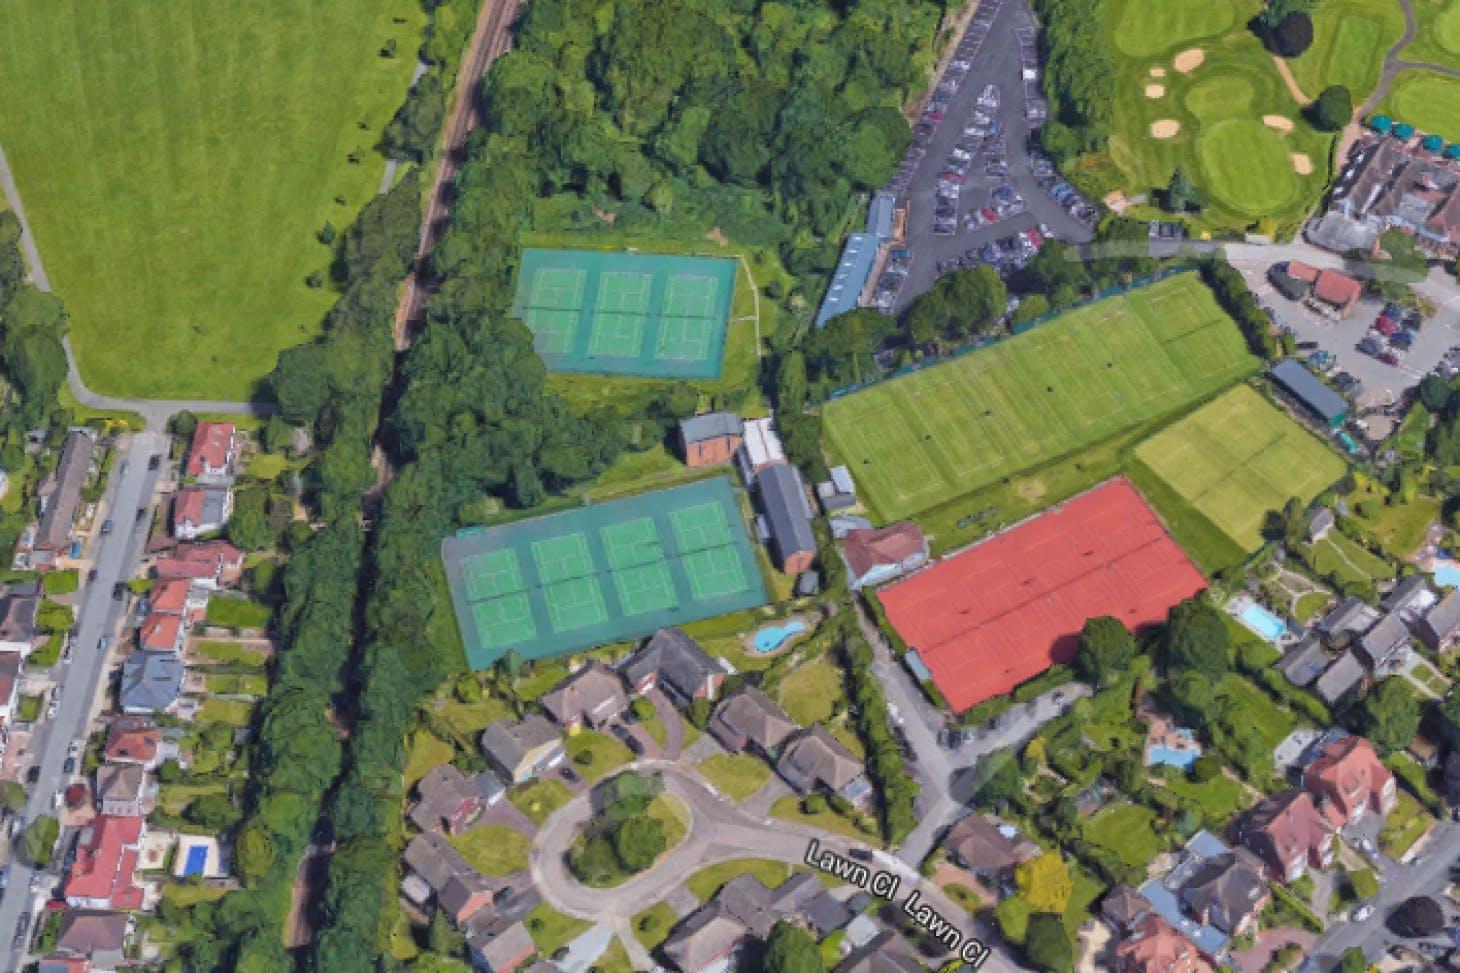 Sundridge Park Lawn Tennis & Squash Rackets Club Outdoor | Hard (macadam) tennis court